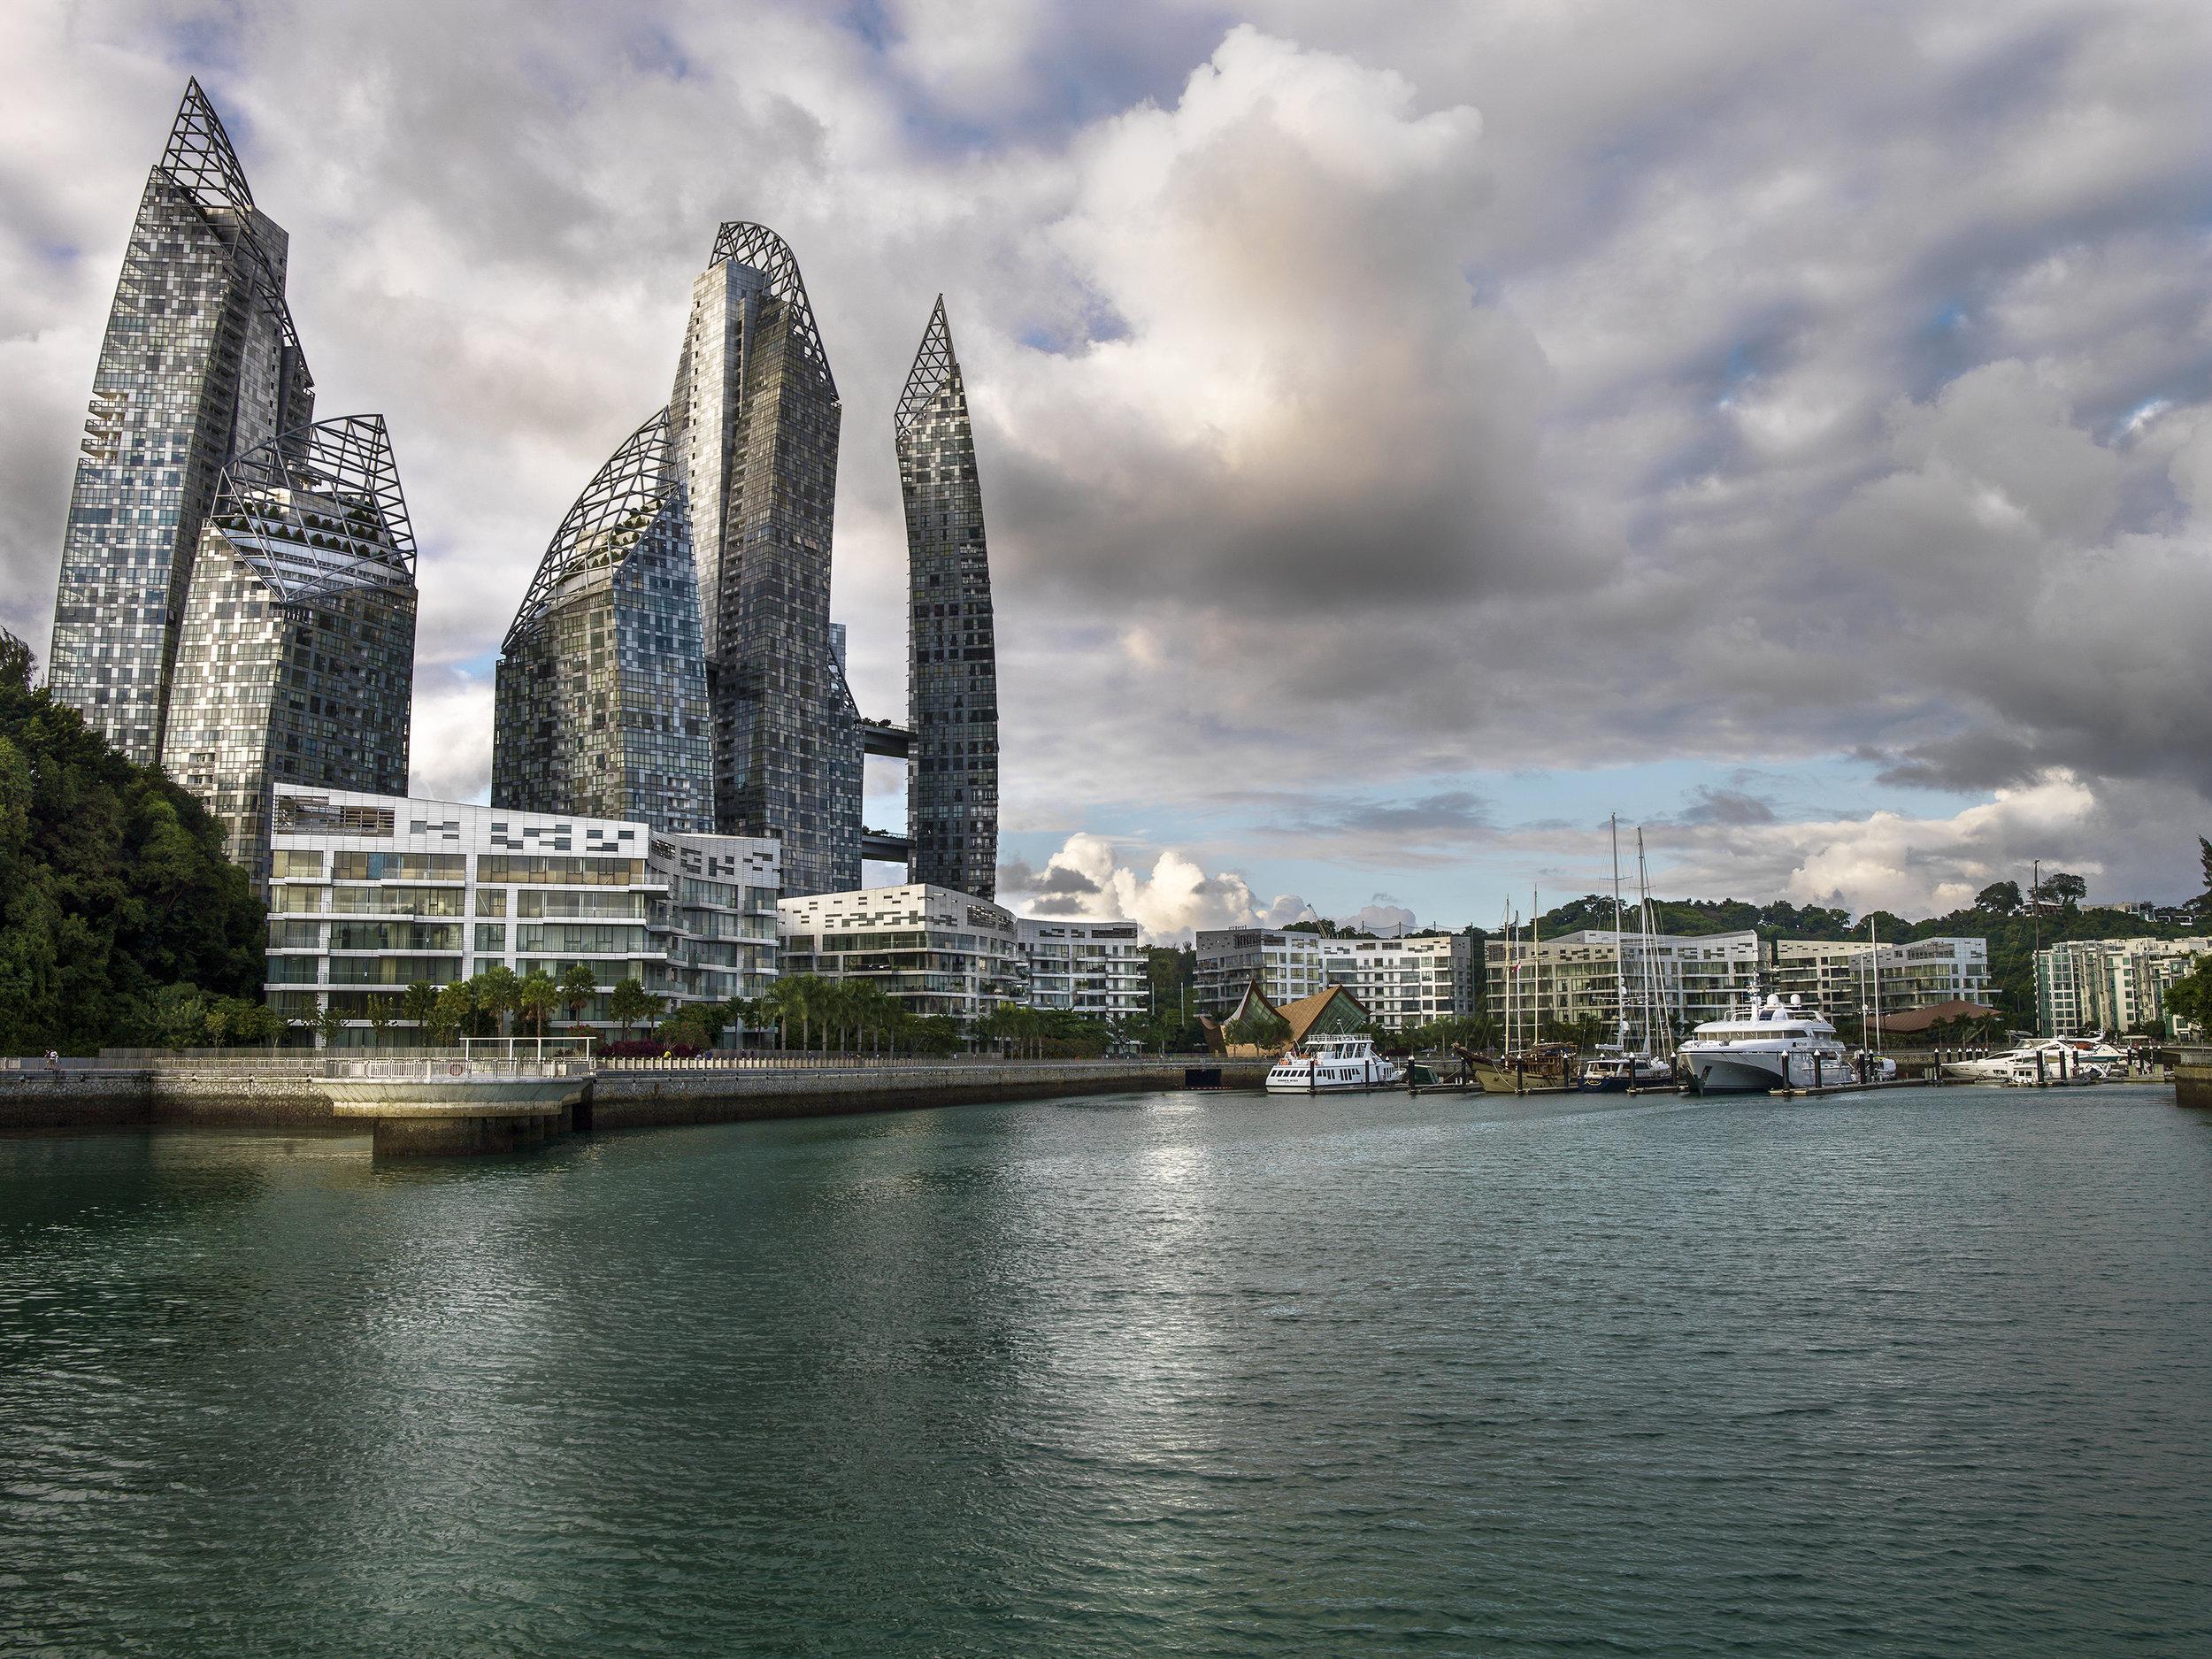 Reflections at Keppel Bay, Singapore. 2013